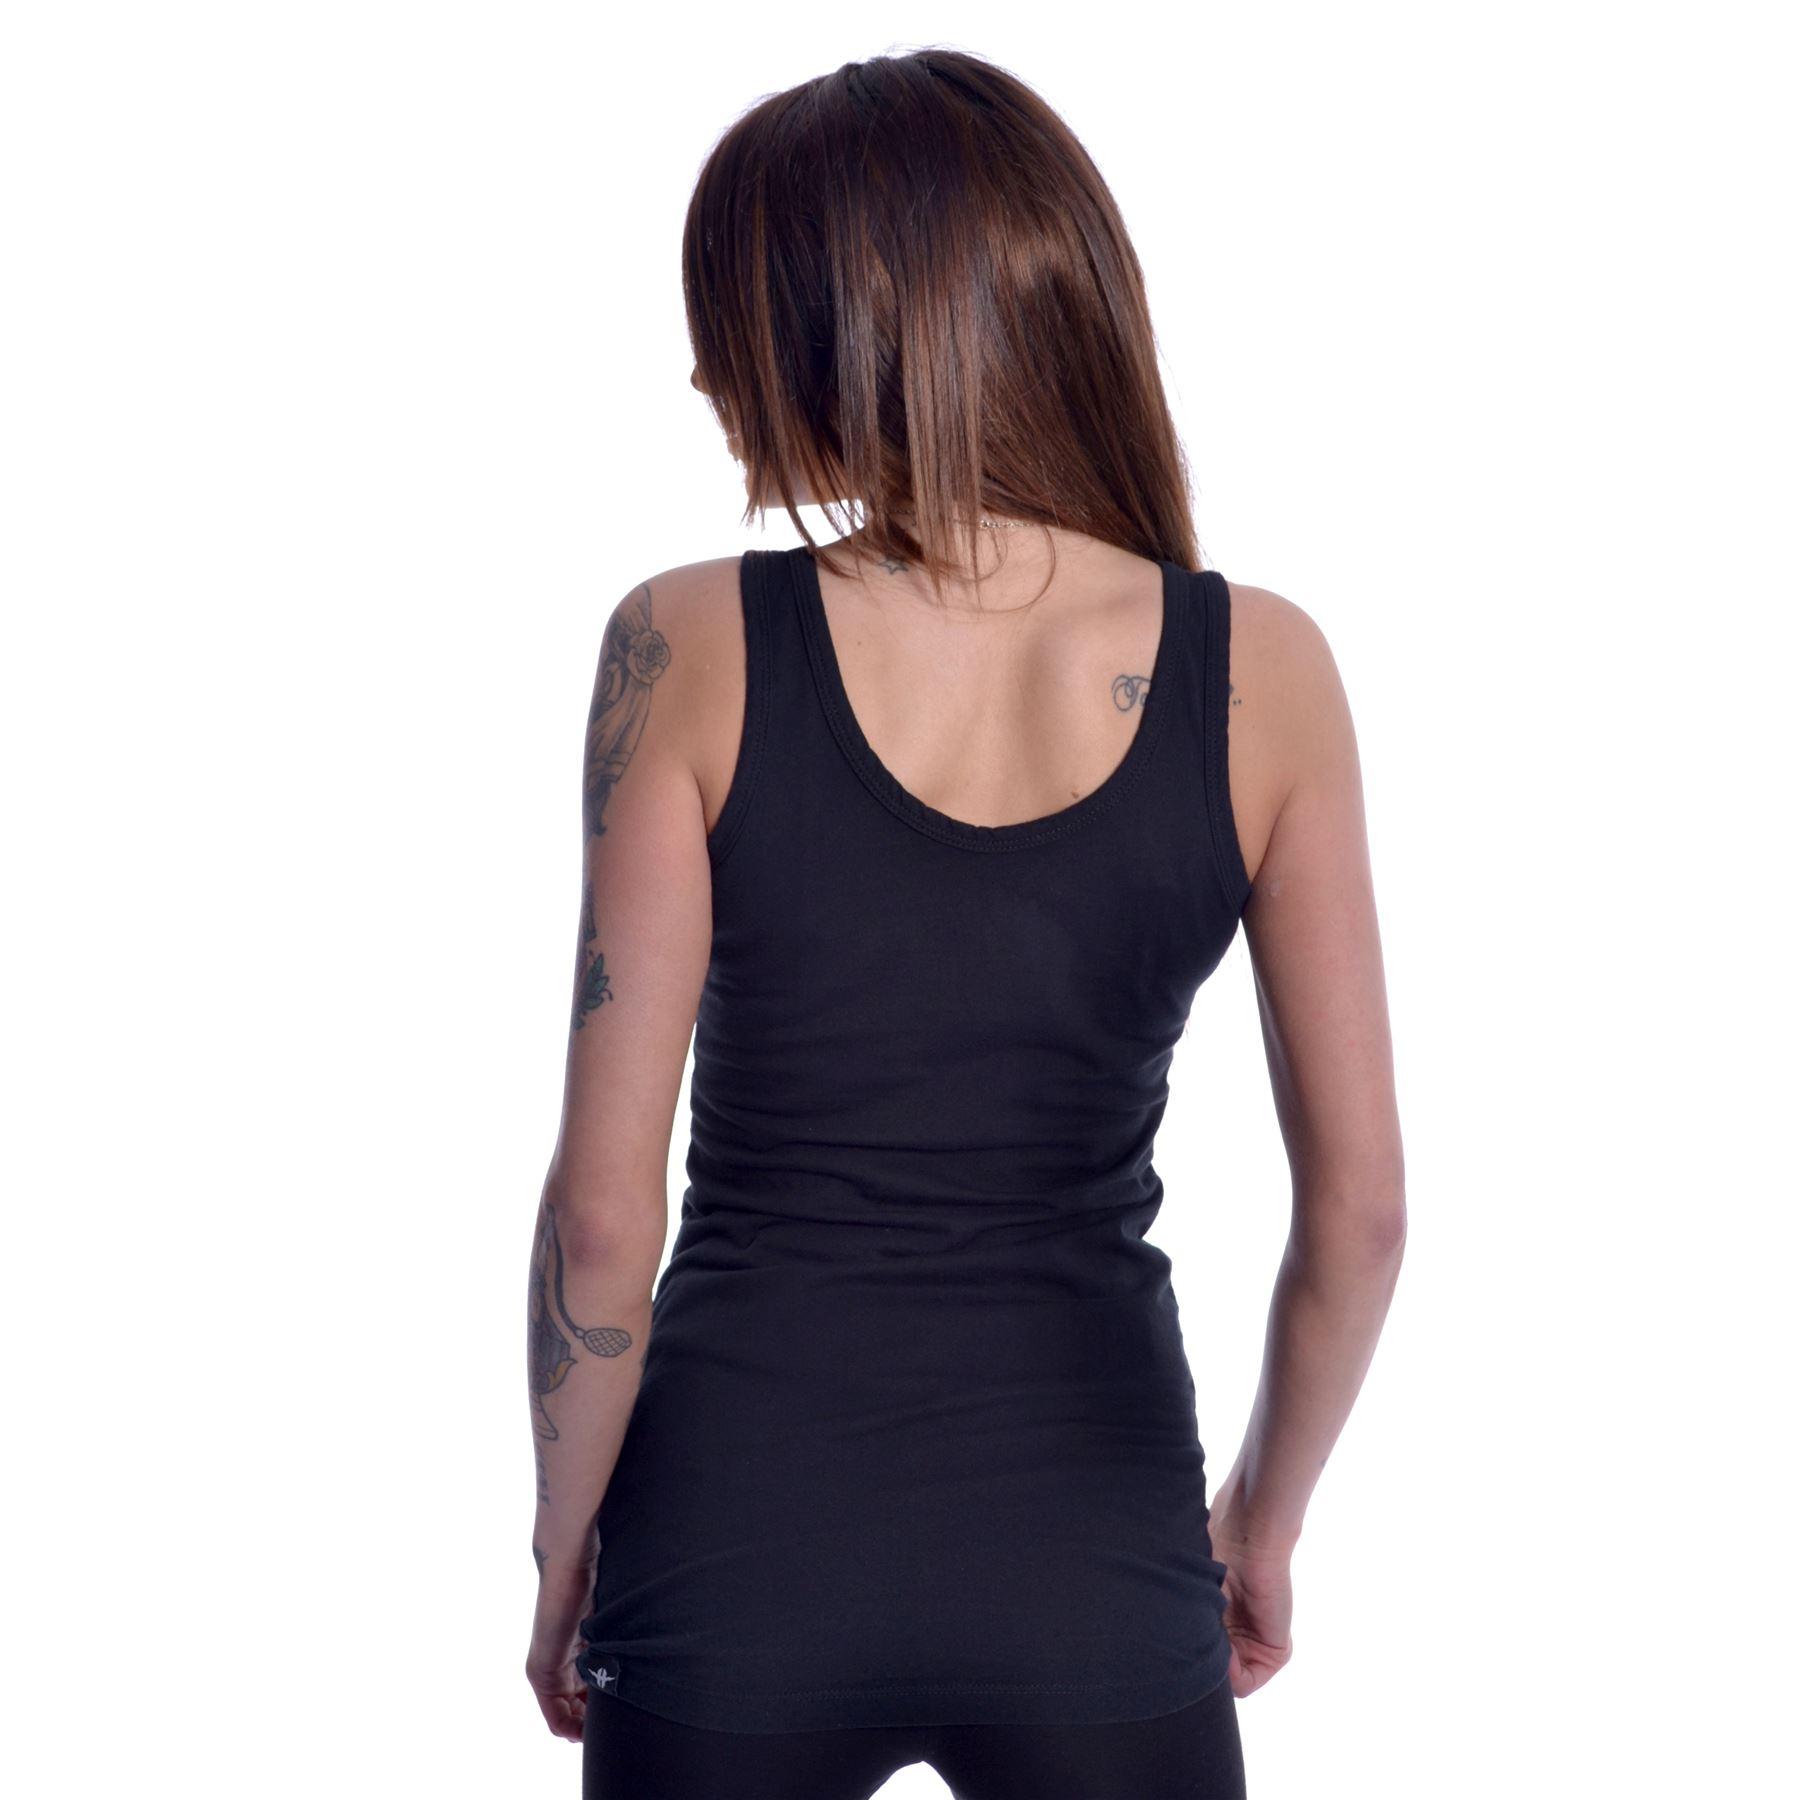 Heartless Death Mermaid Vest Ladies Black Goth Emo Punk